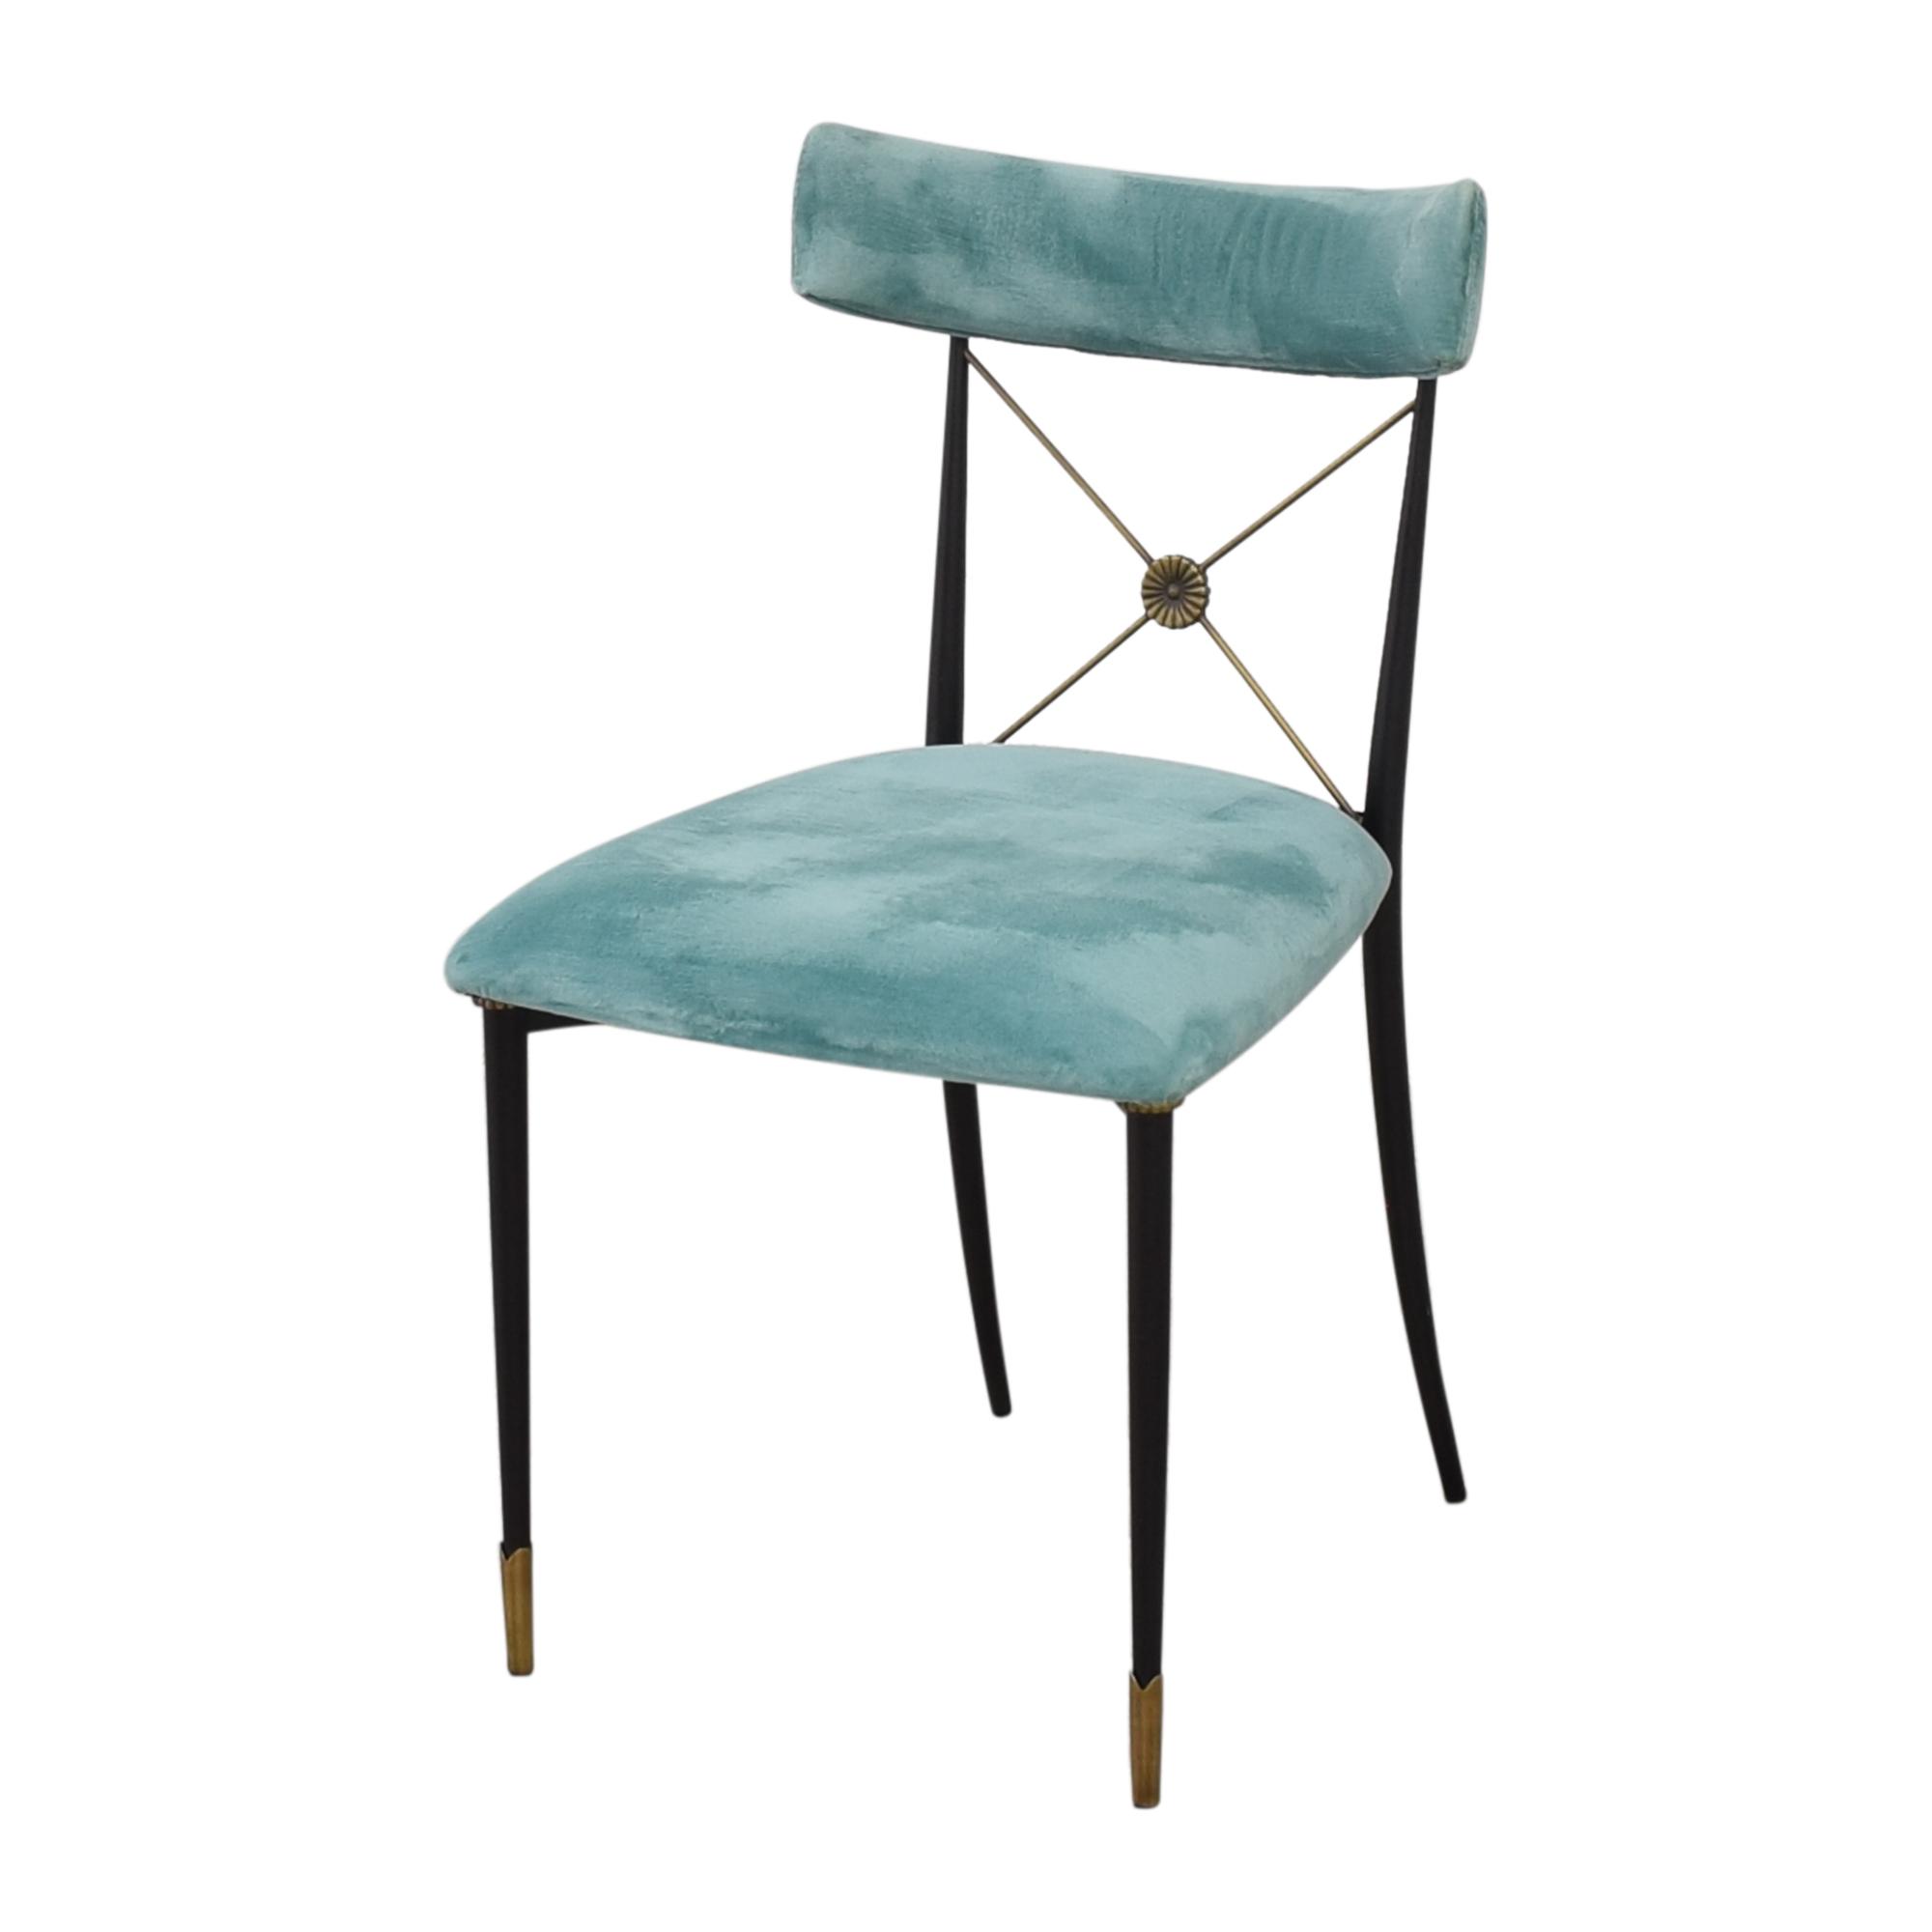 Jonathan Adler Jonathan Adler Rider Chair Chairs